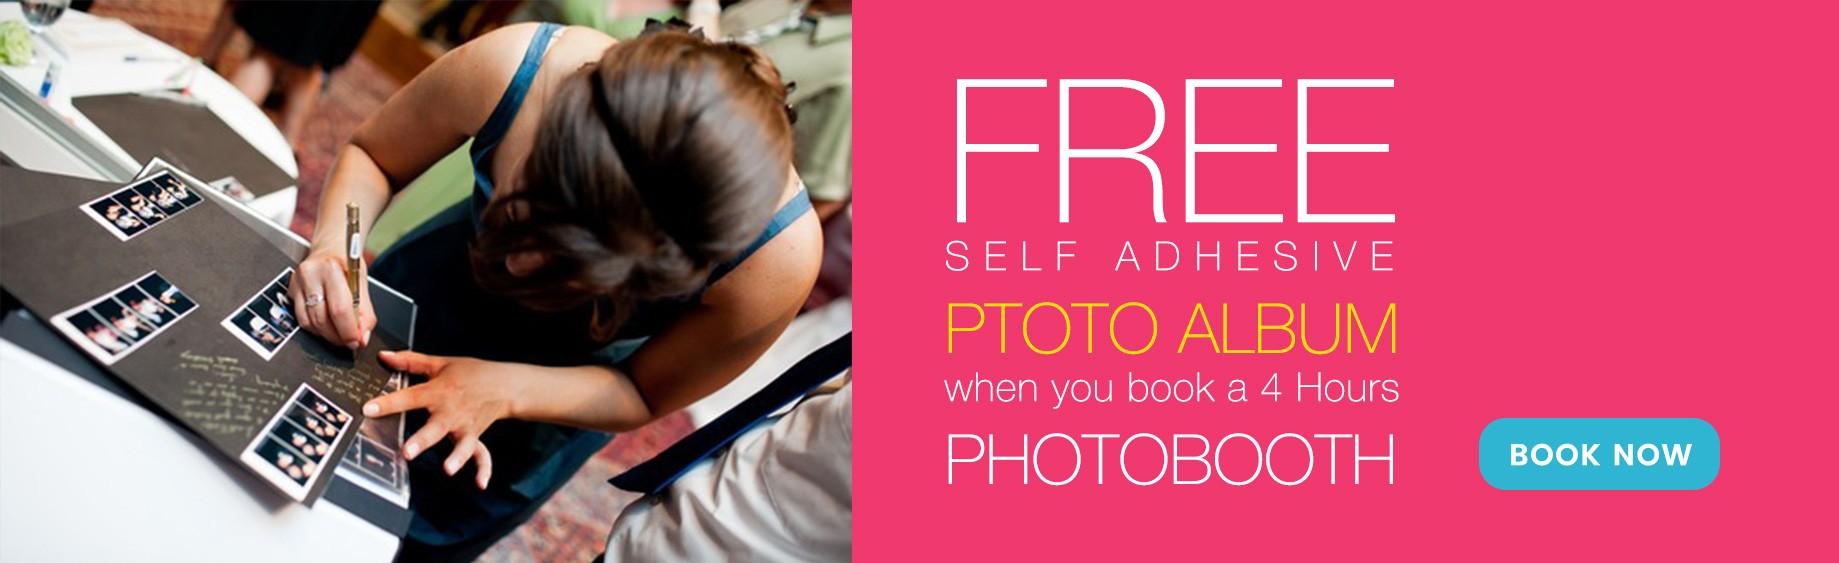 Free Photo Album